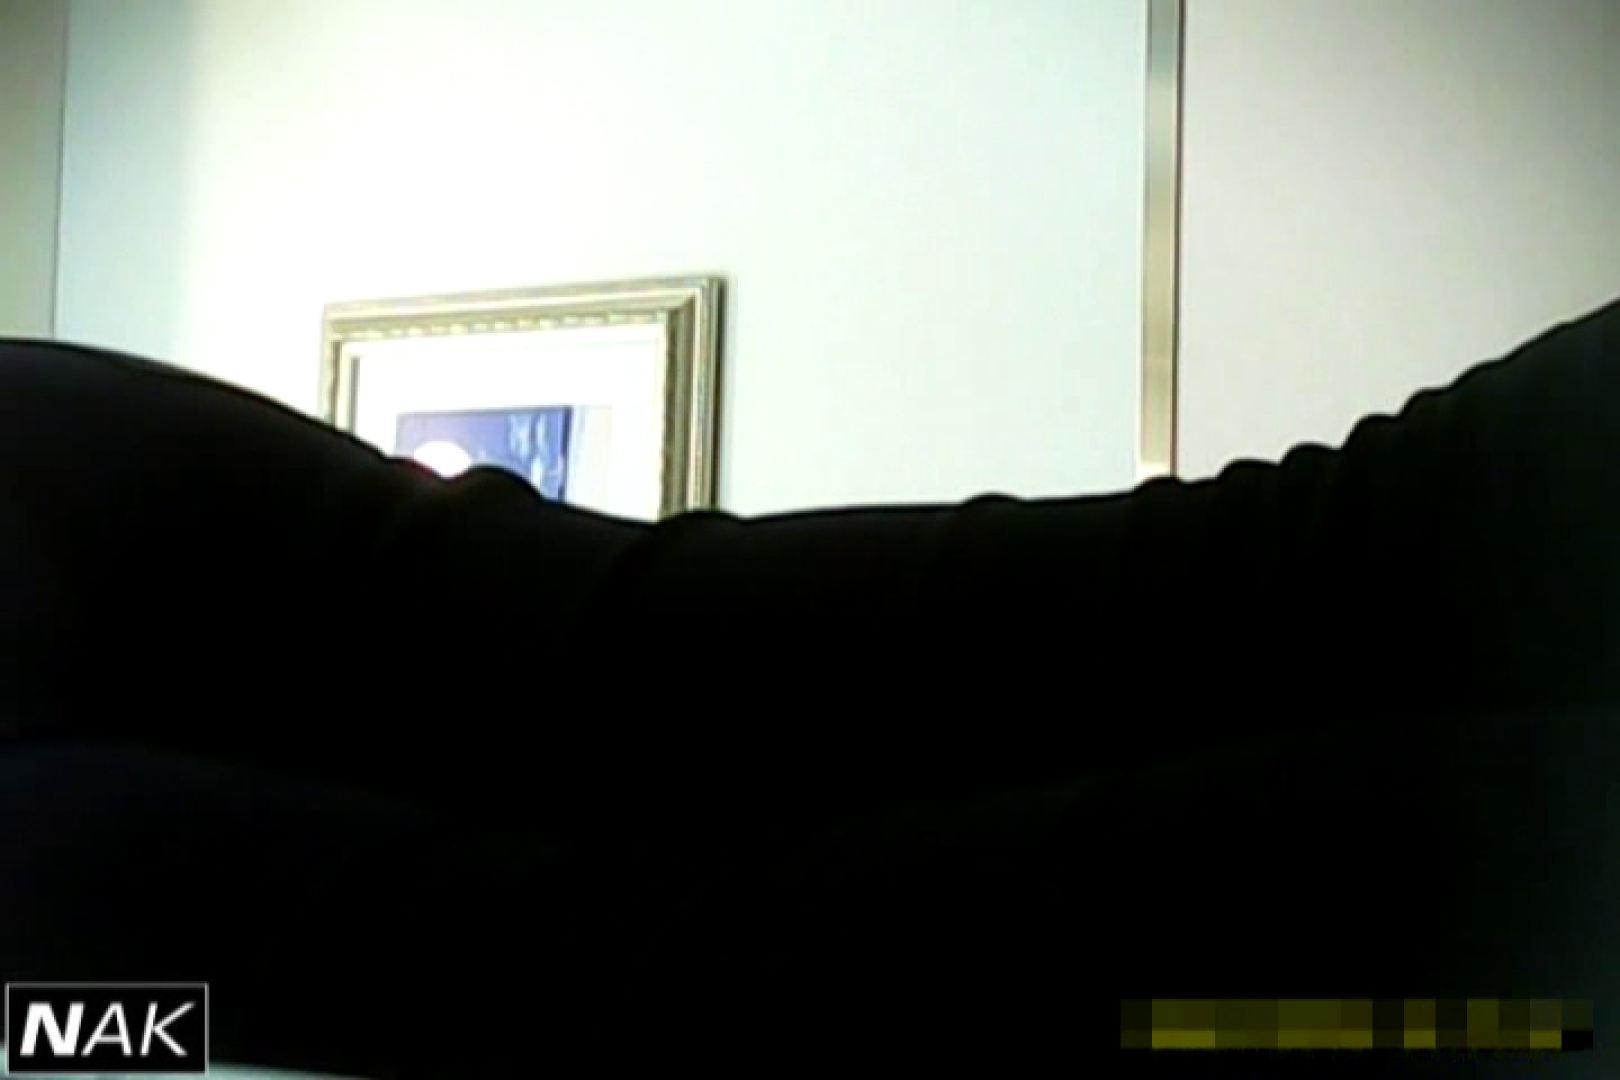 VIP史上初!脅威の3点かわや! vol.08 無修正オマンコ すけべAV動画紹介 82画像 28